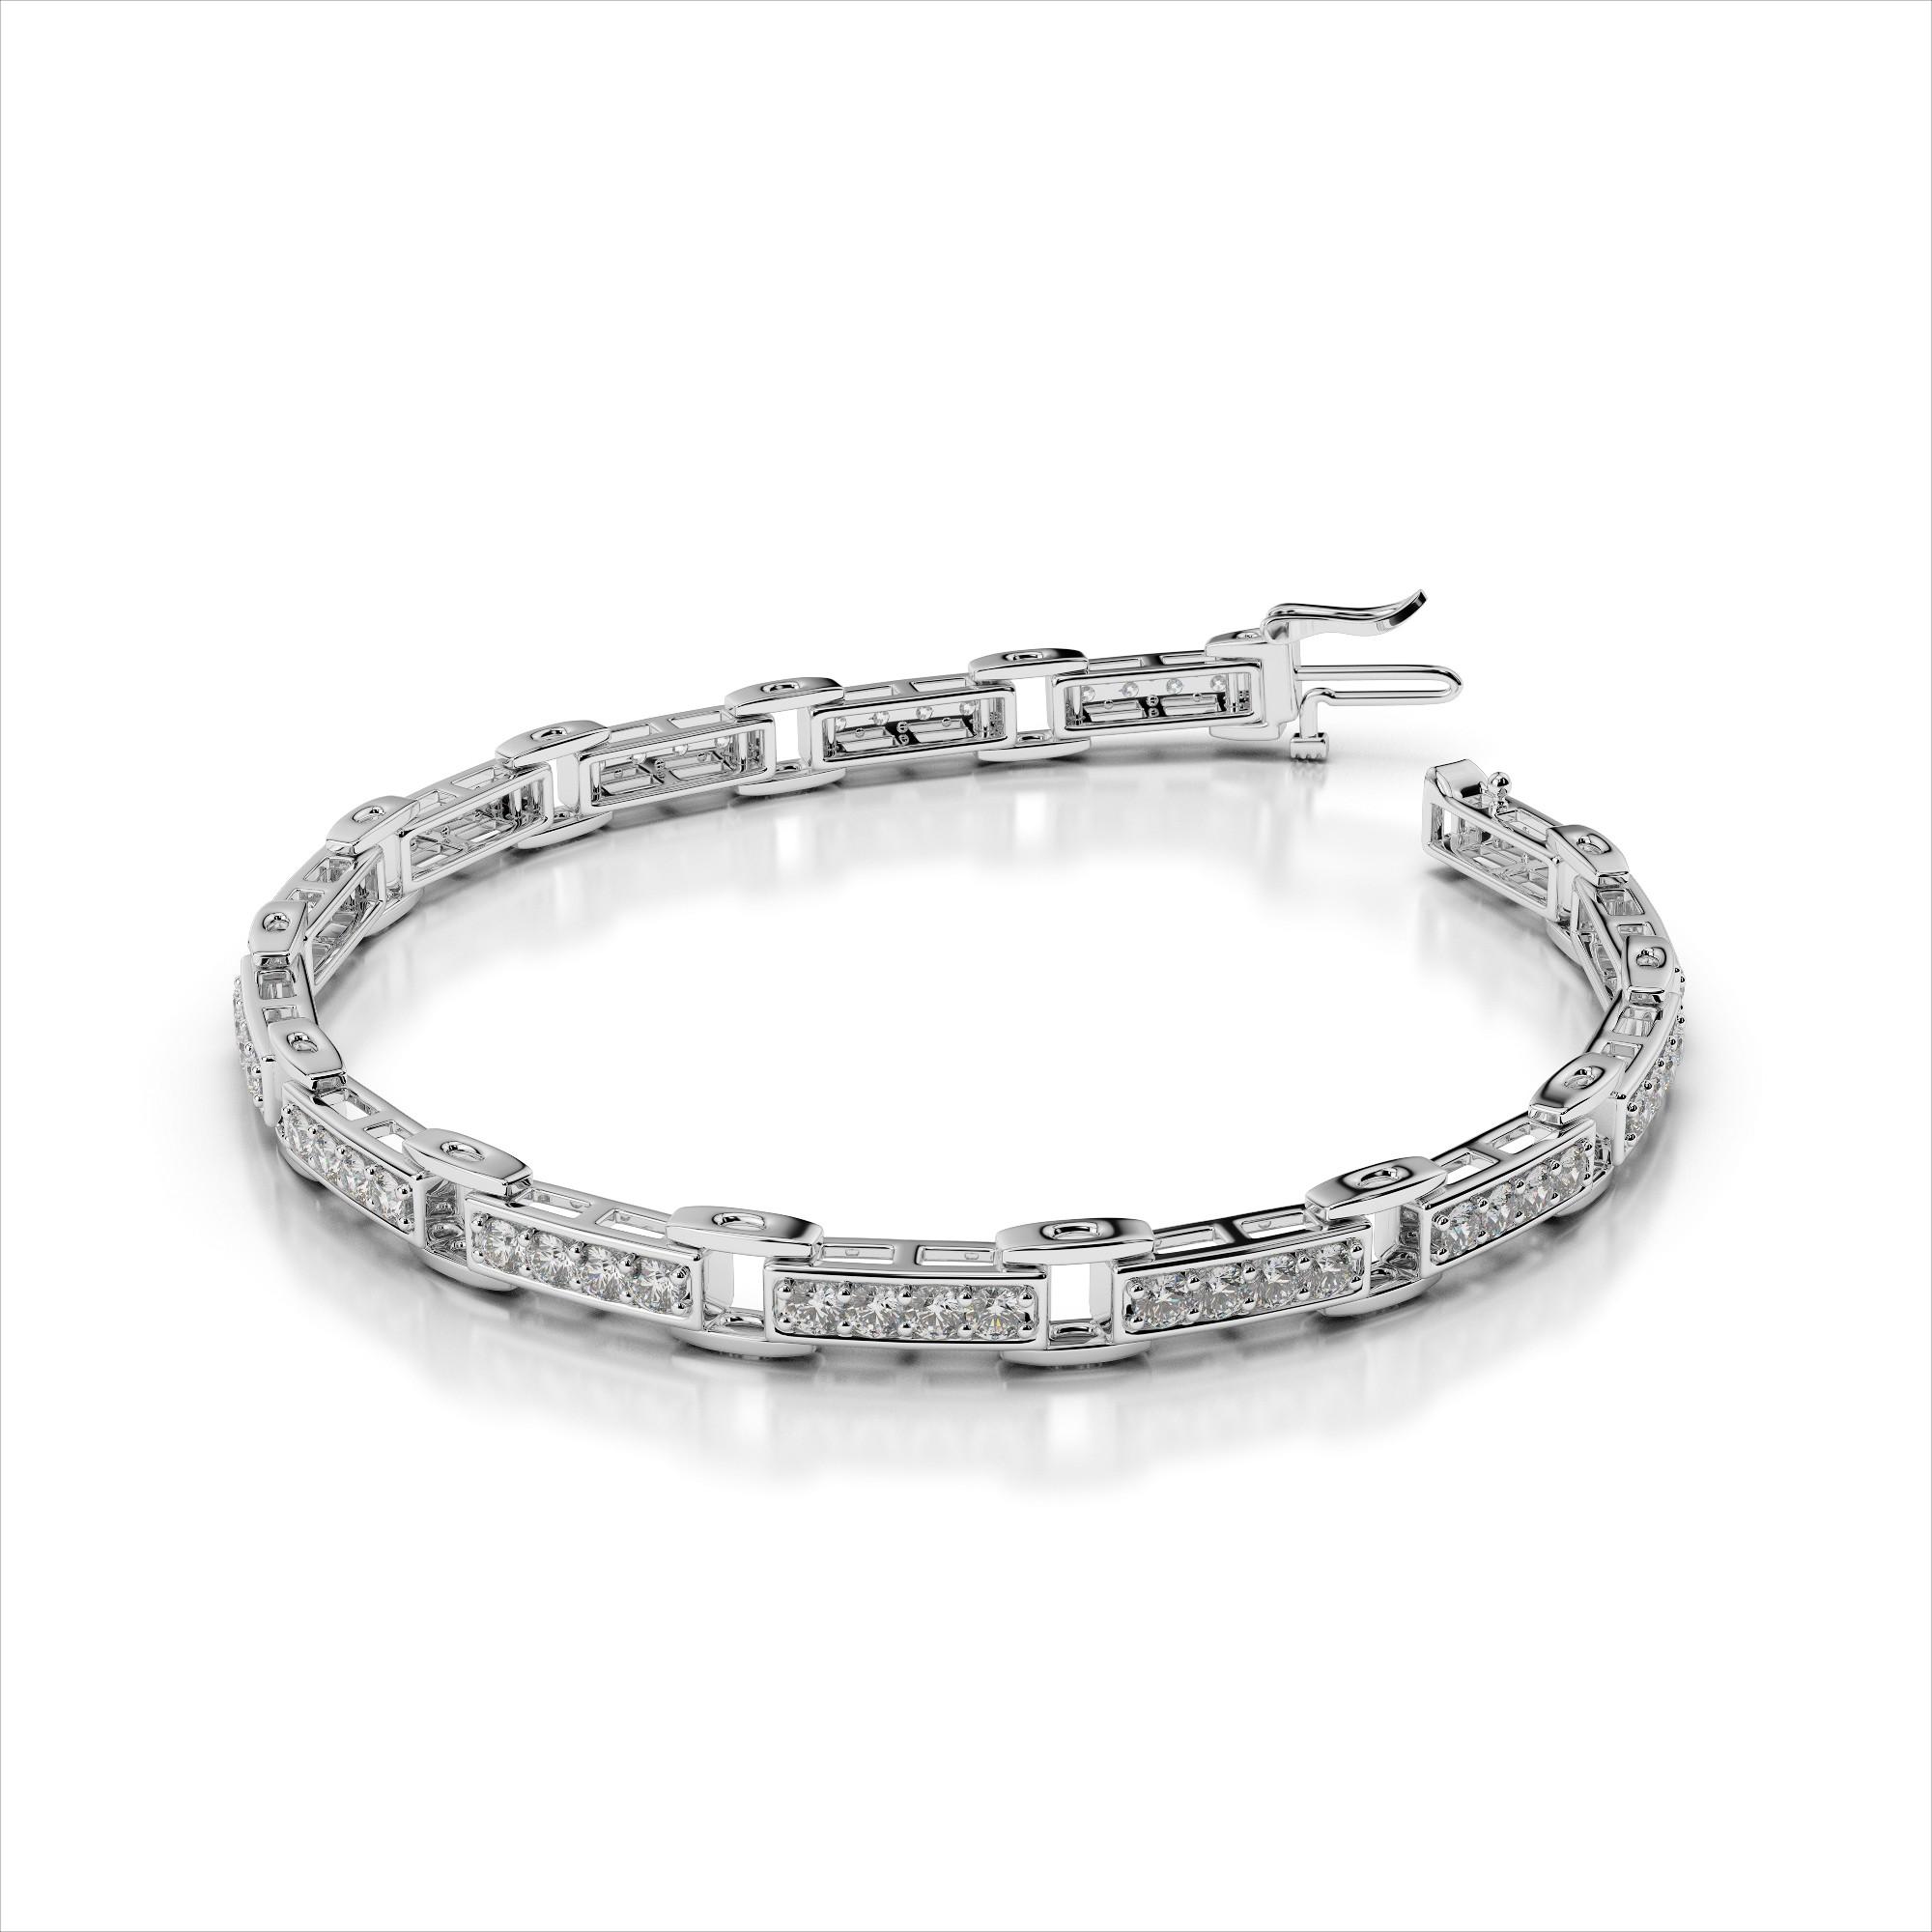 Four Diamond Link Bracelet